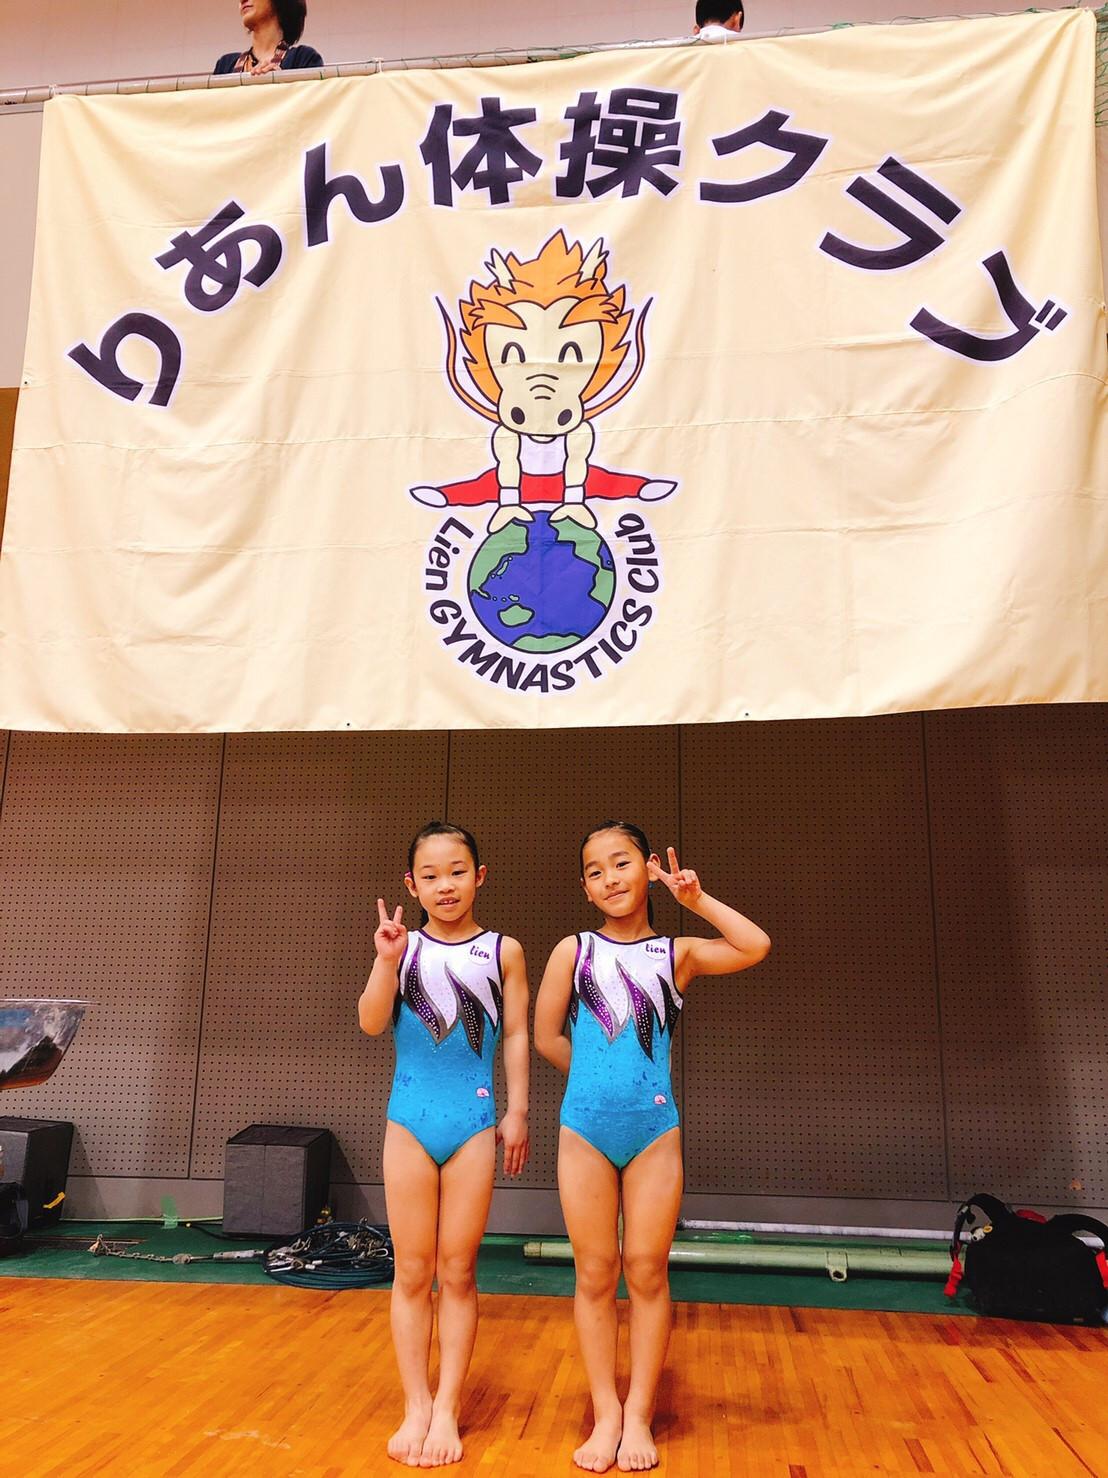 2019年AJG大会in三重県画像12